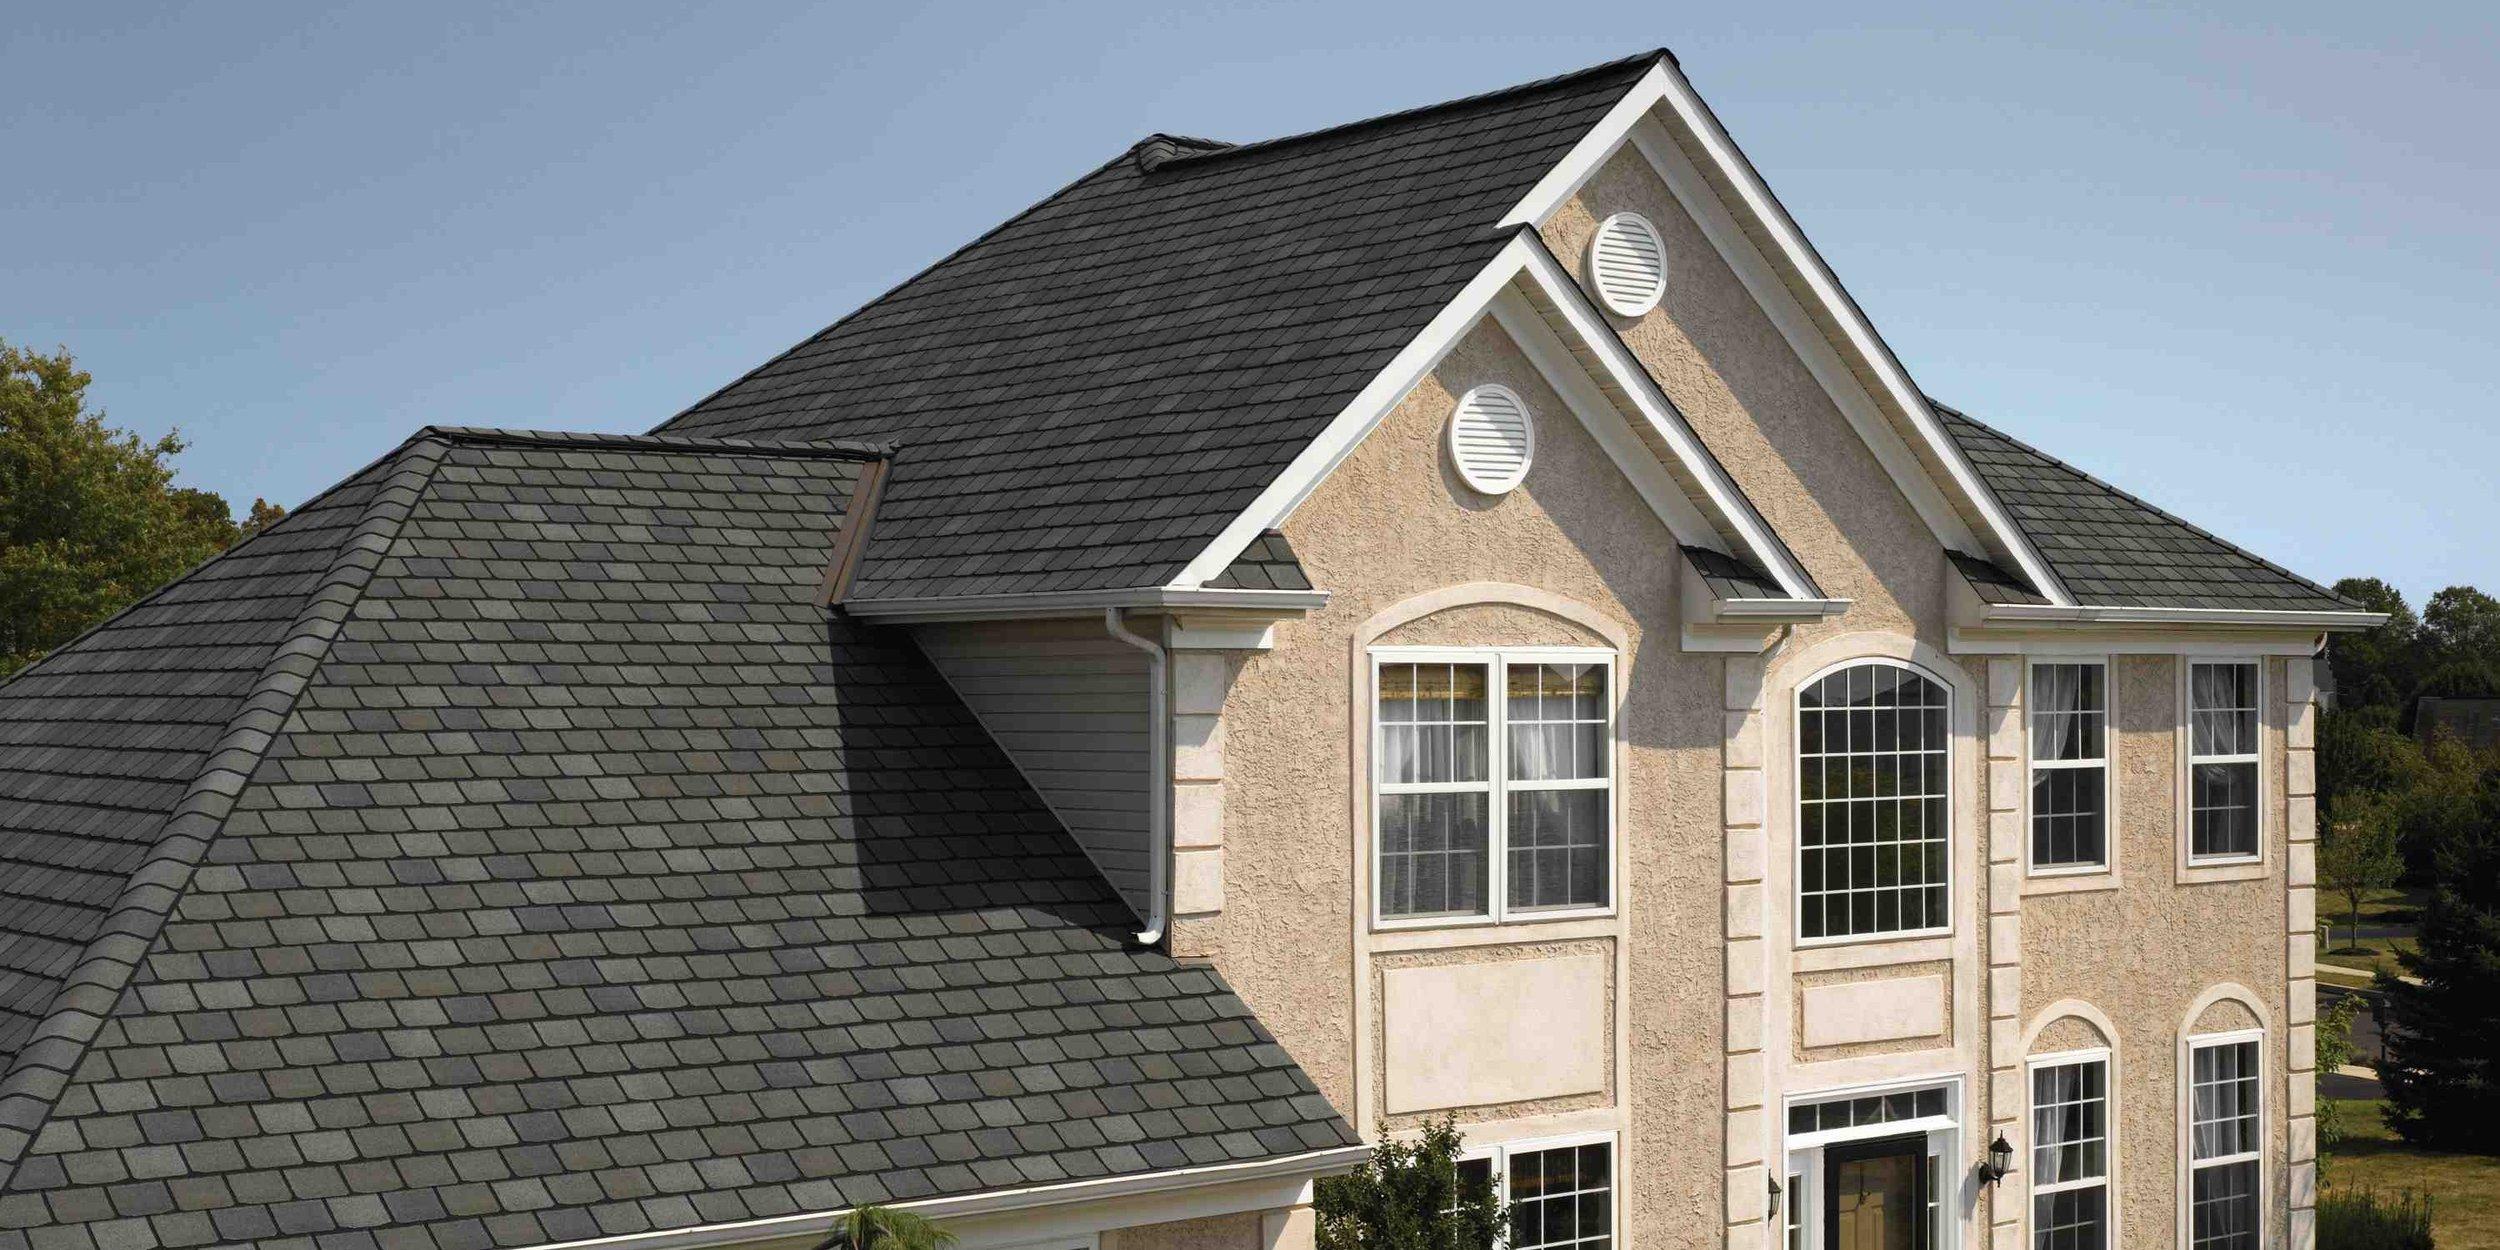 roofing-shingles-for-sale-3-e1384801210368.jpeg